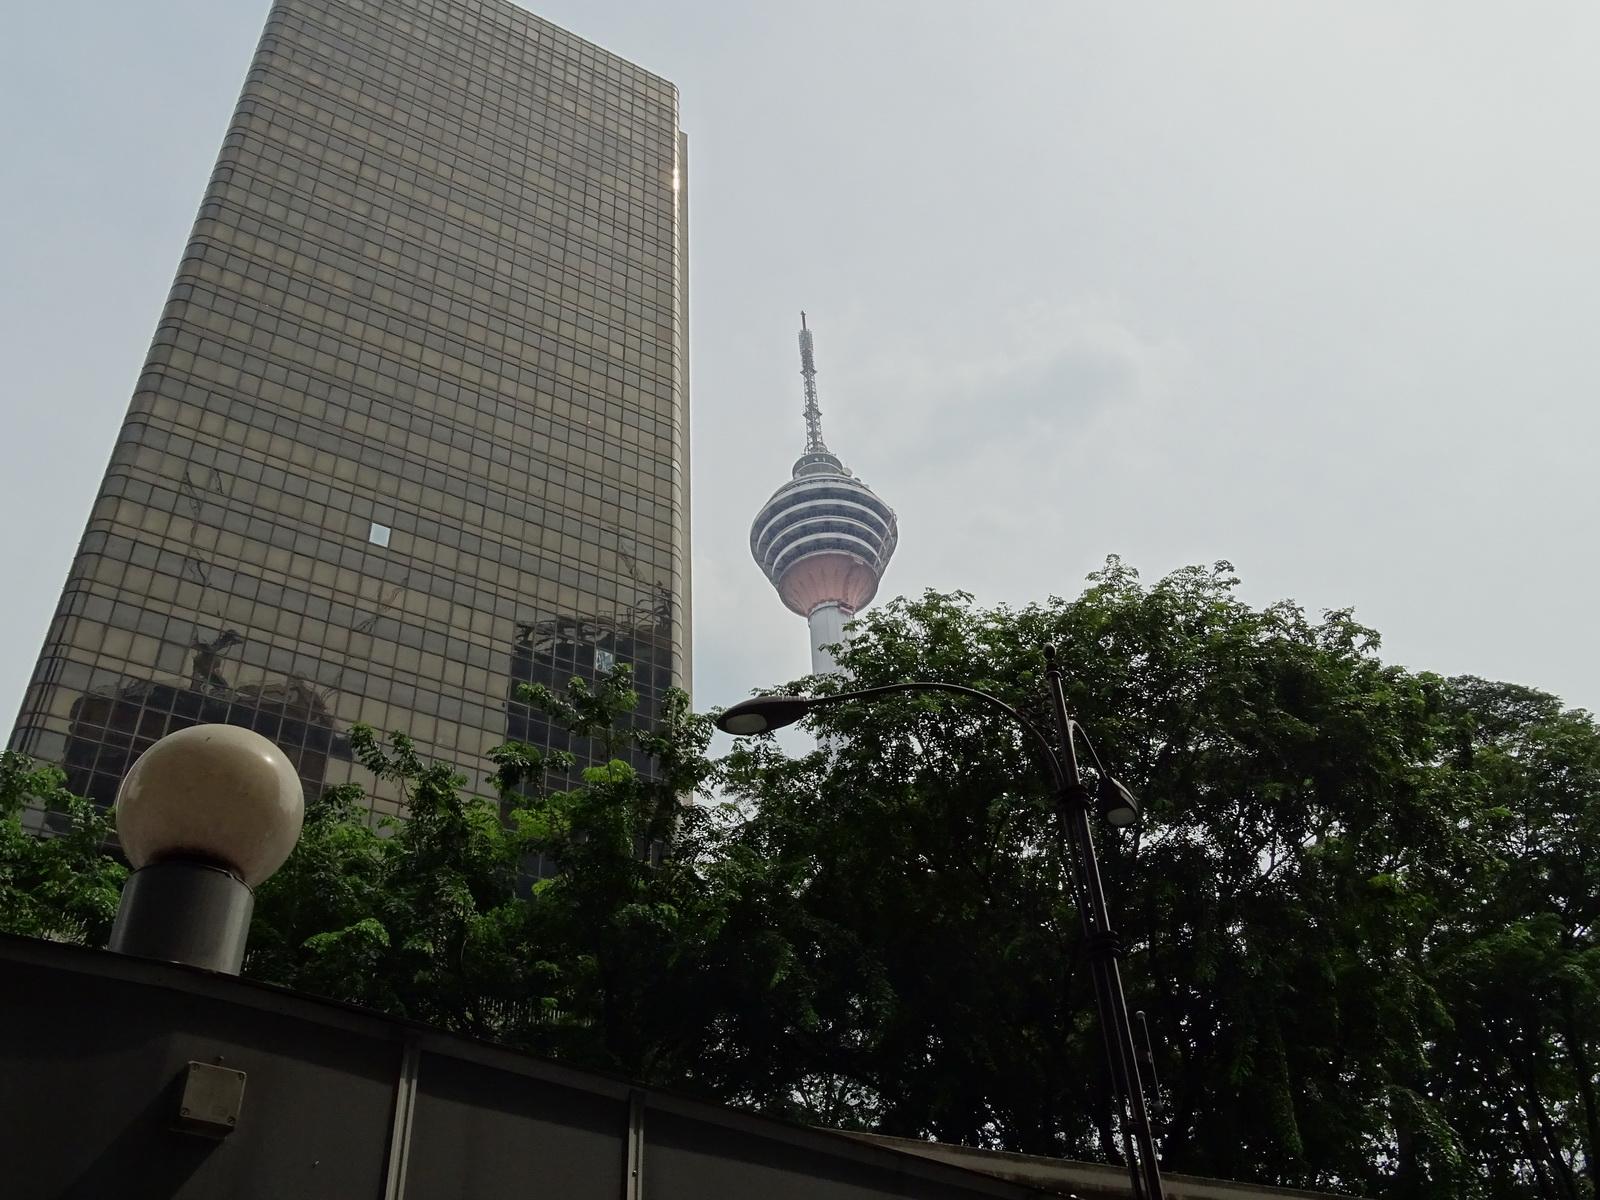 05 KL Tower 47